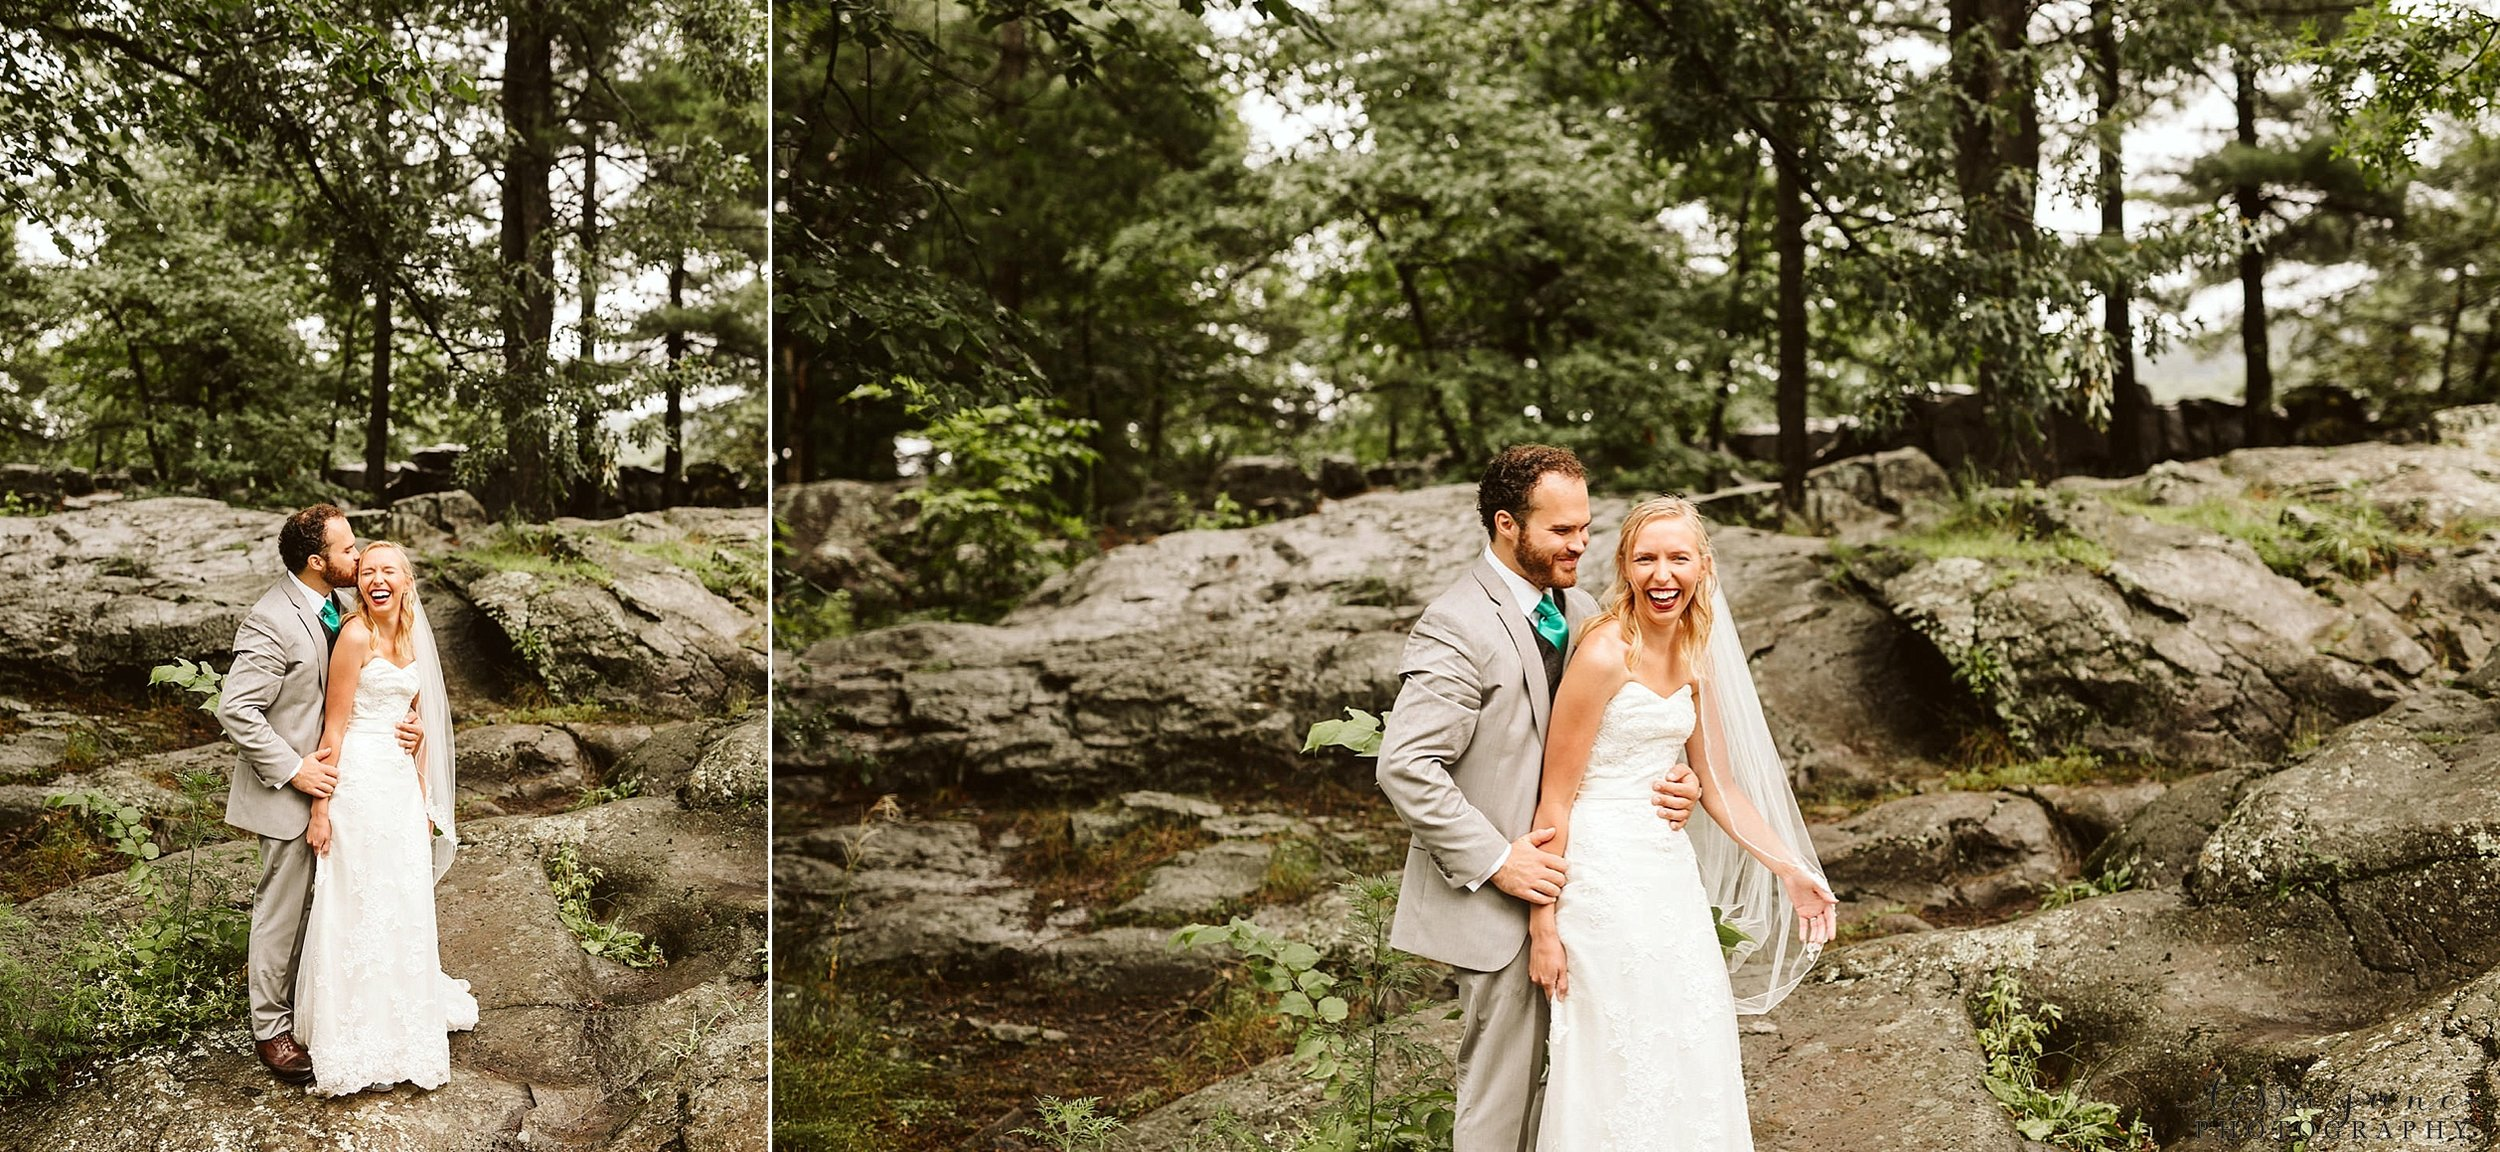 taylors-falls-rainy-elopement-wedding-interstate-state-park-85.jpg